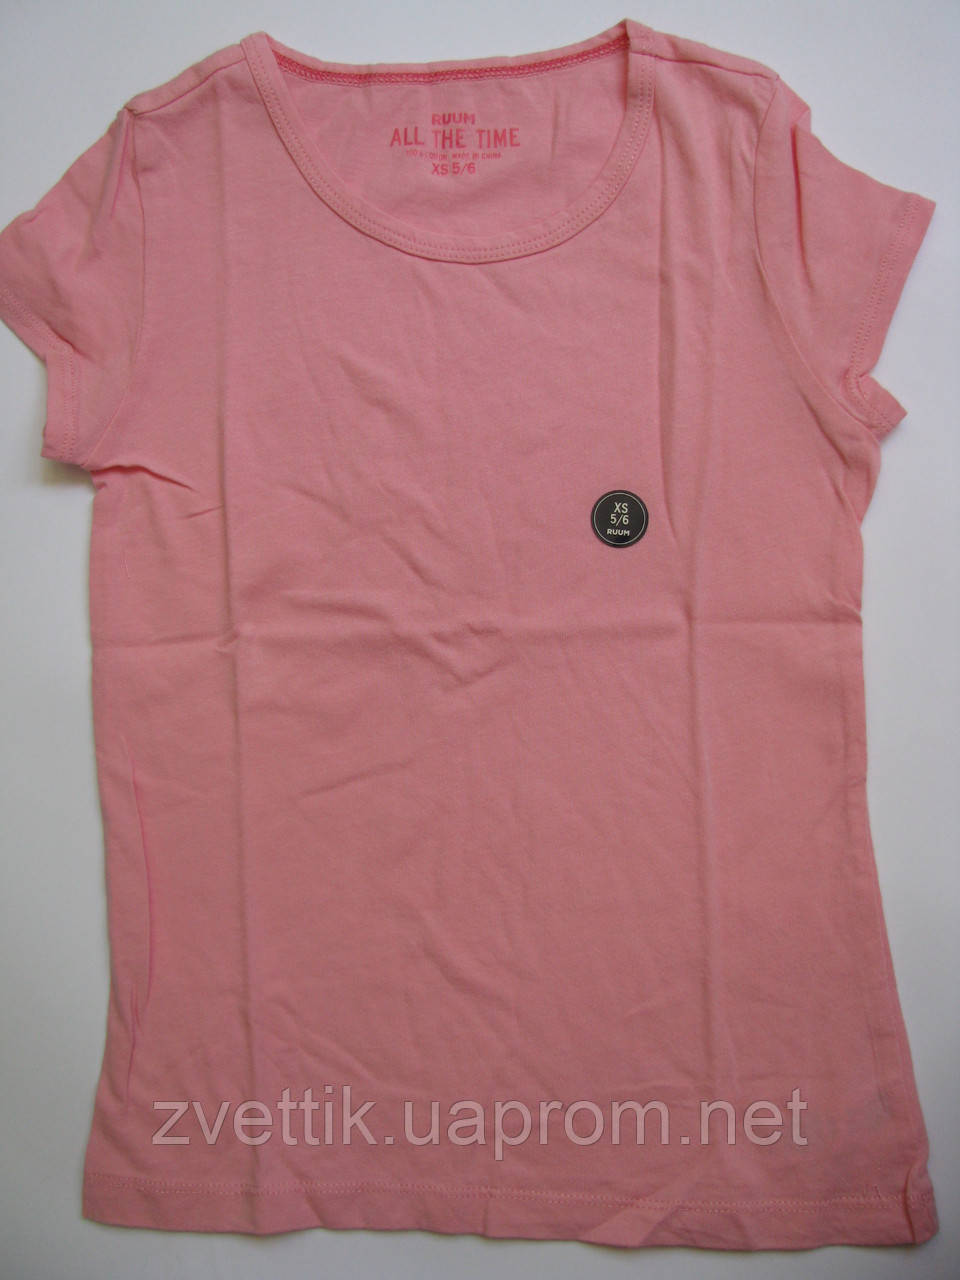 Розовая хлопковая футболка (Размер XS5-6) RUUM (США)